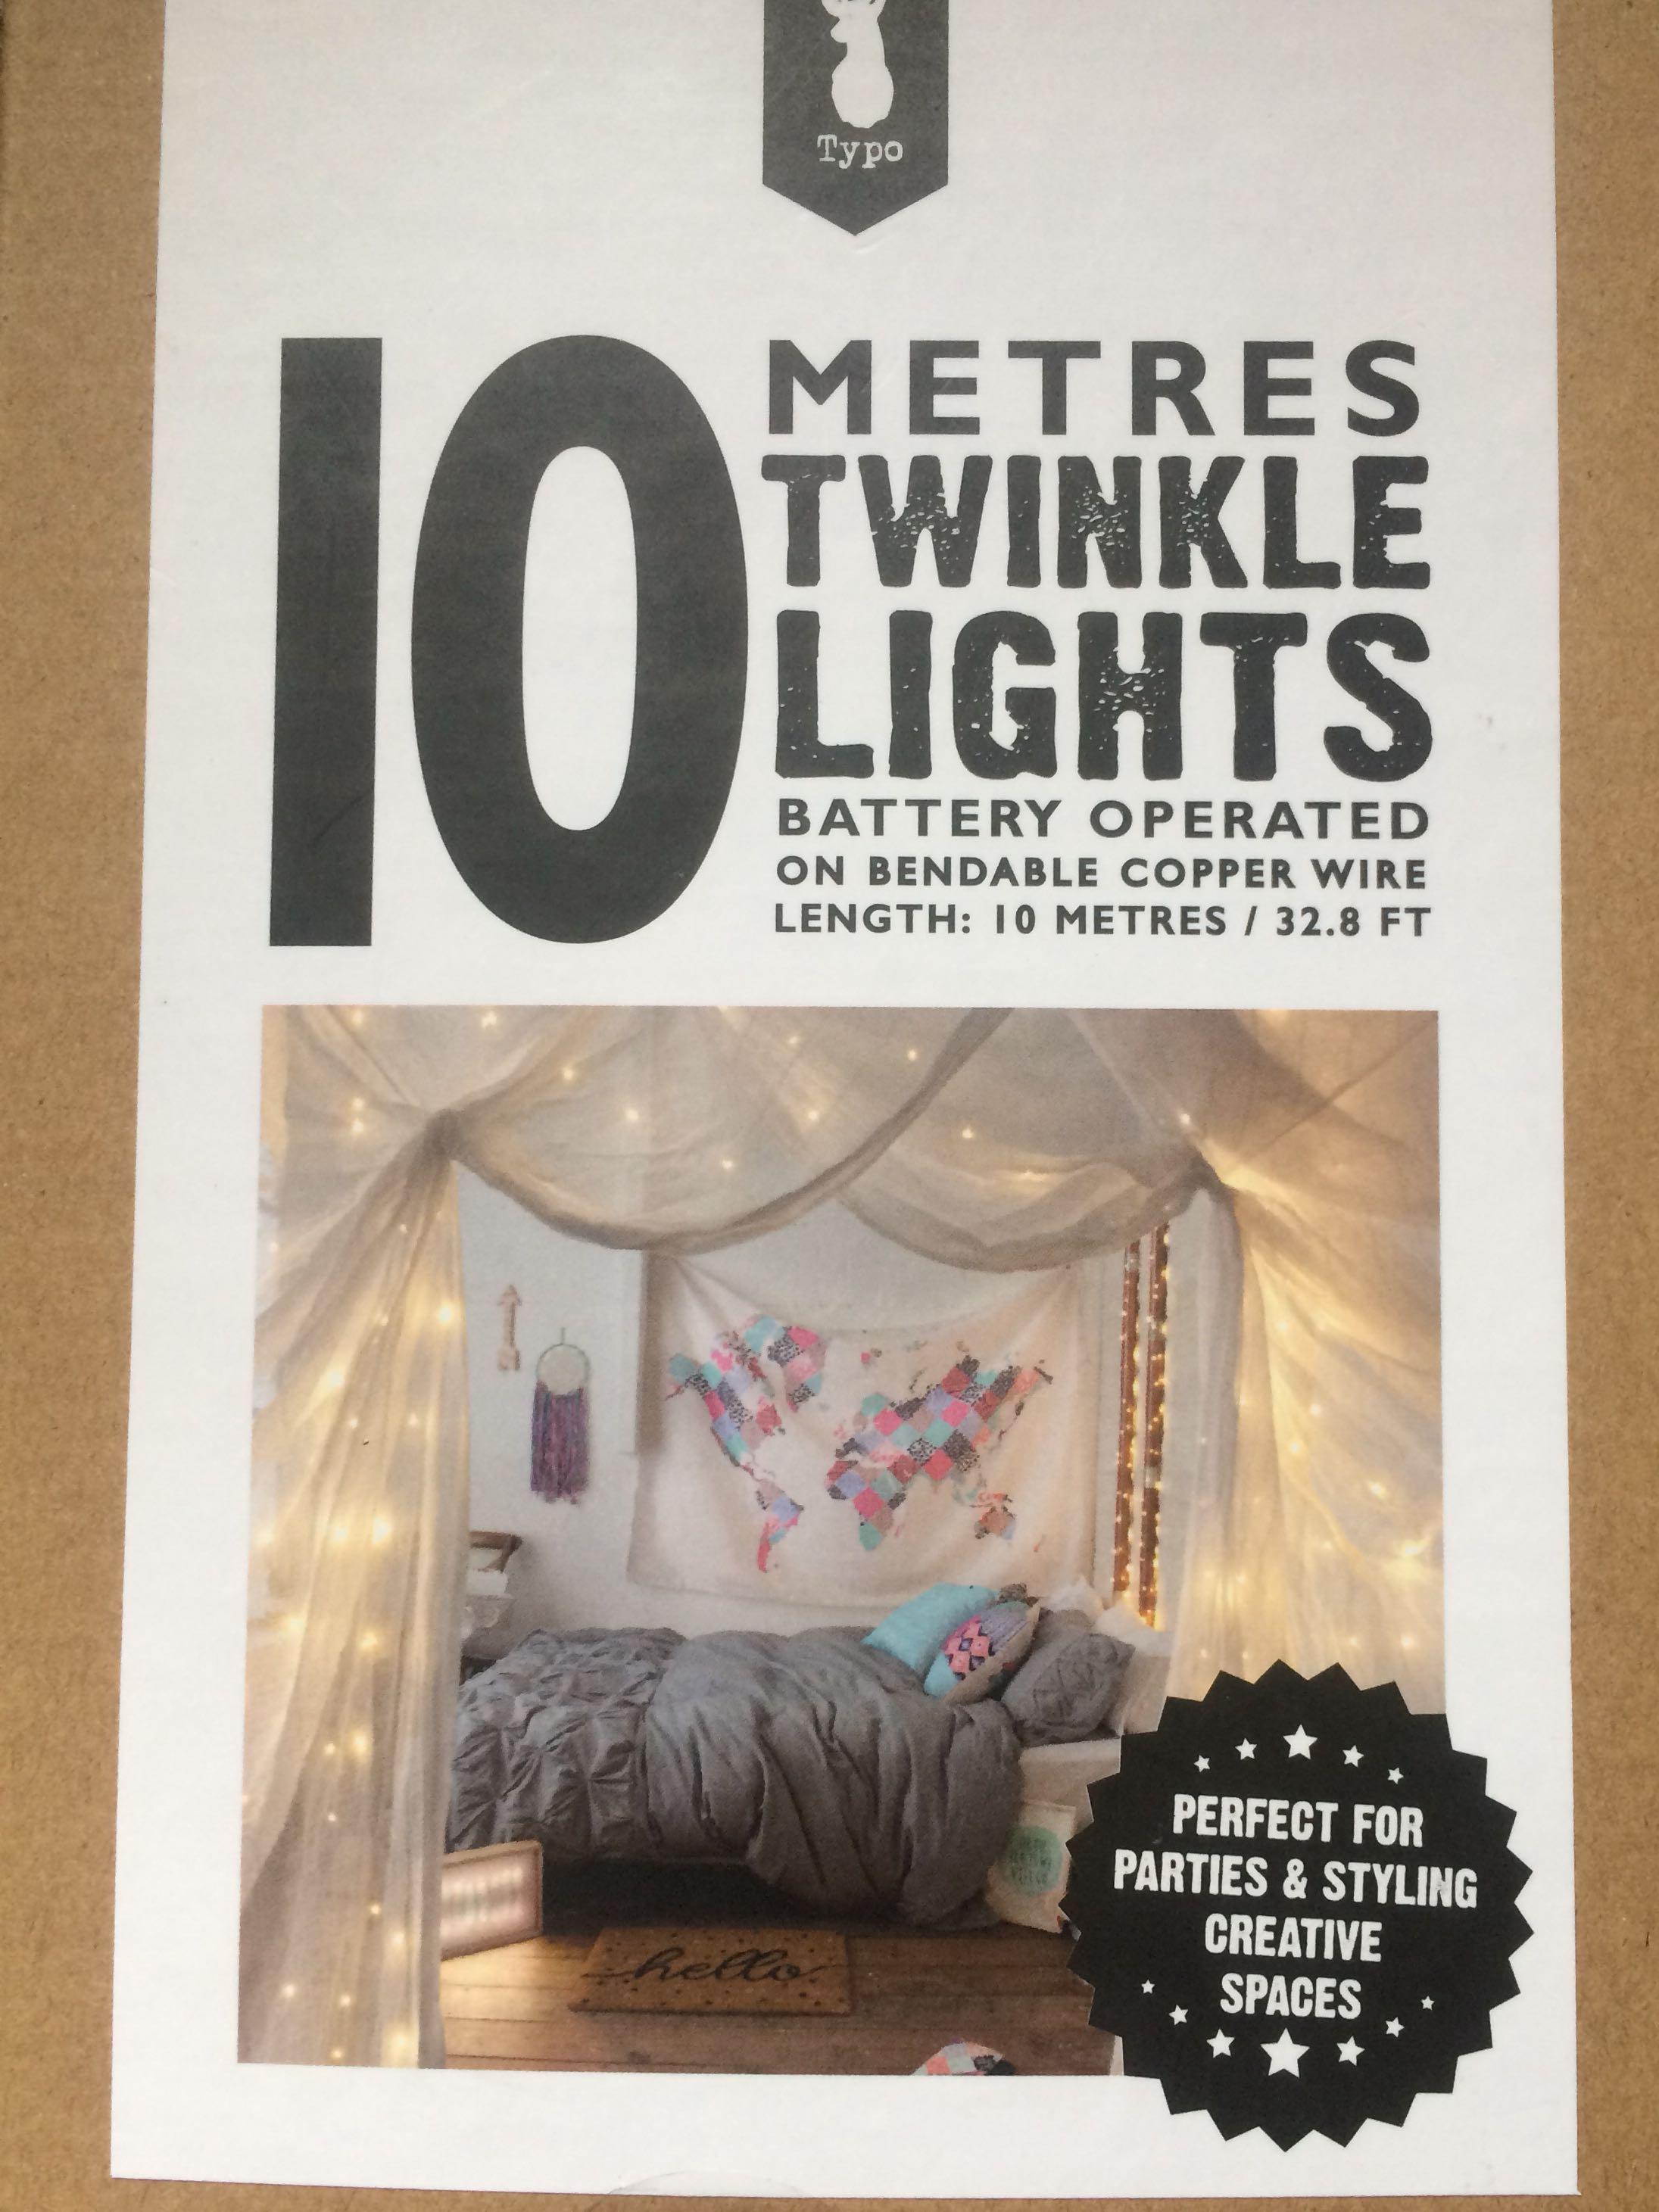 Typo 10 Metres Twinkle Lights